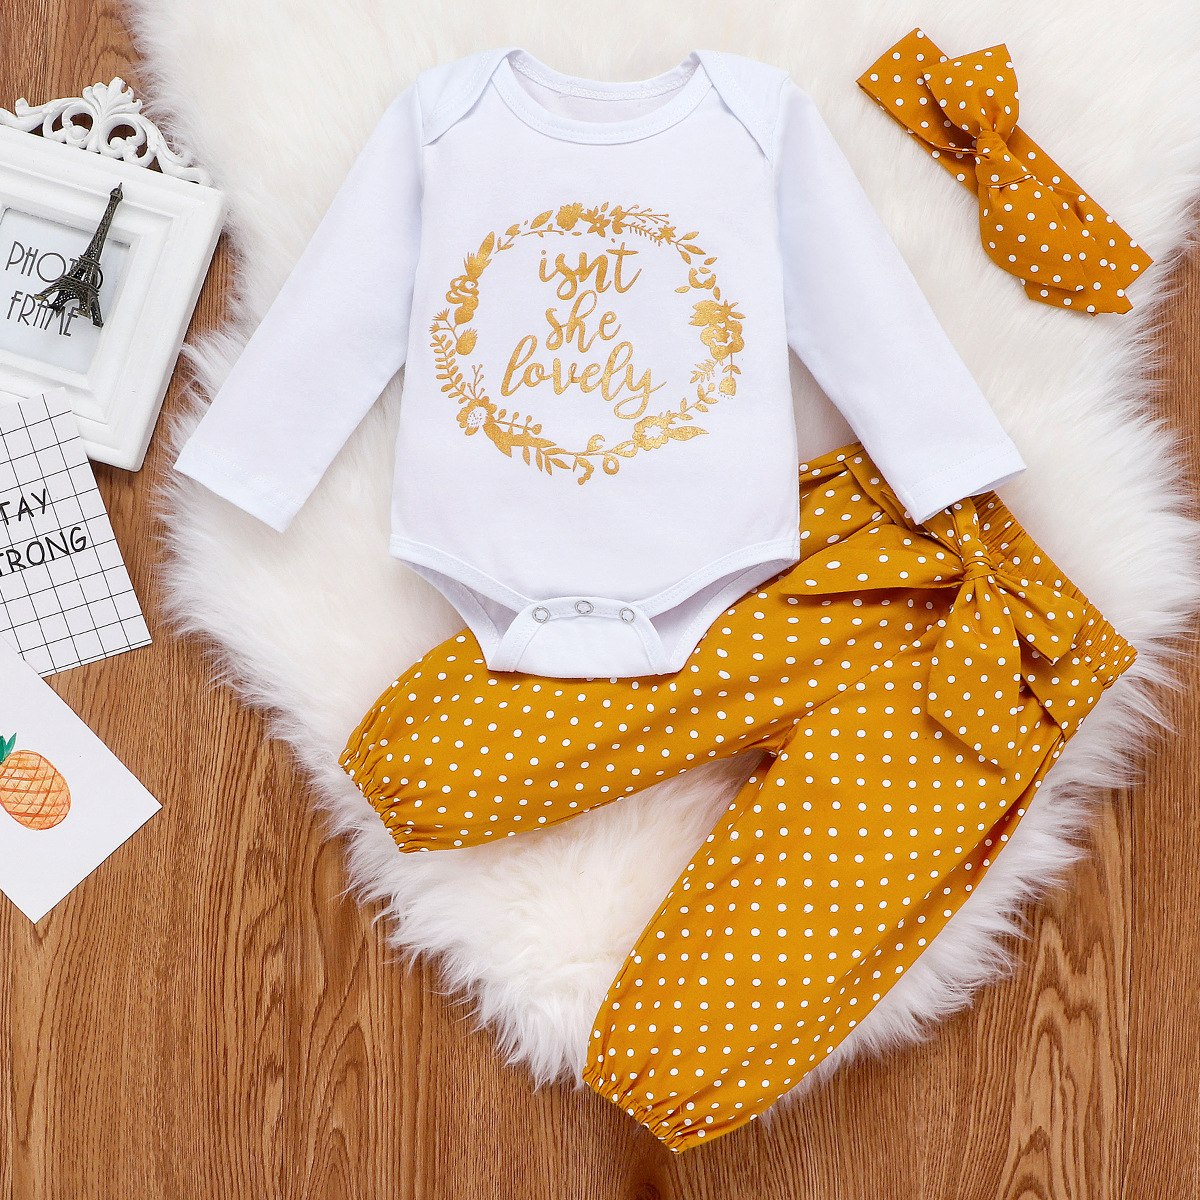 CYSINCOS Newborn Infant Autumn 3Pcs Set Cotton Letter Romper Dot Pants Headband Spring Outfits Clothes Baby Girls Clothing Suit